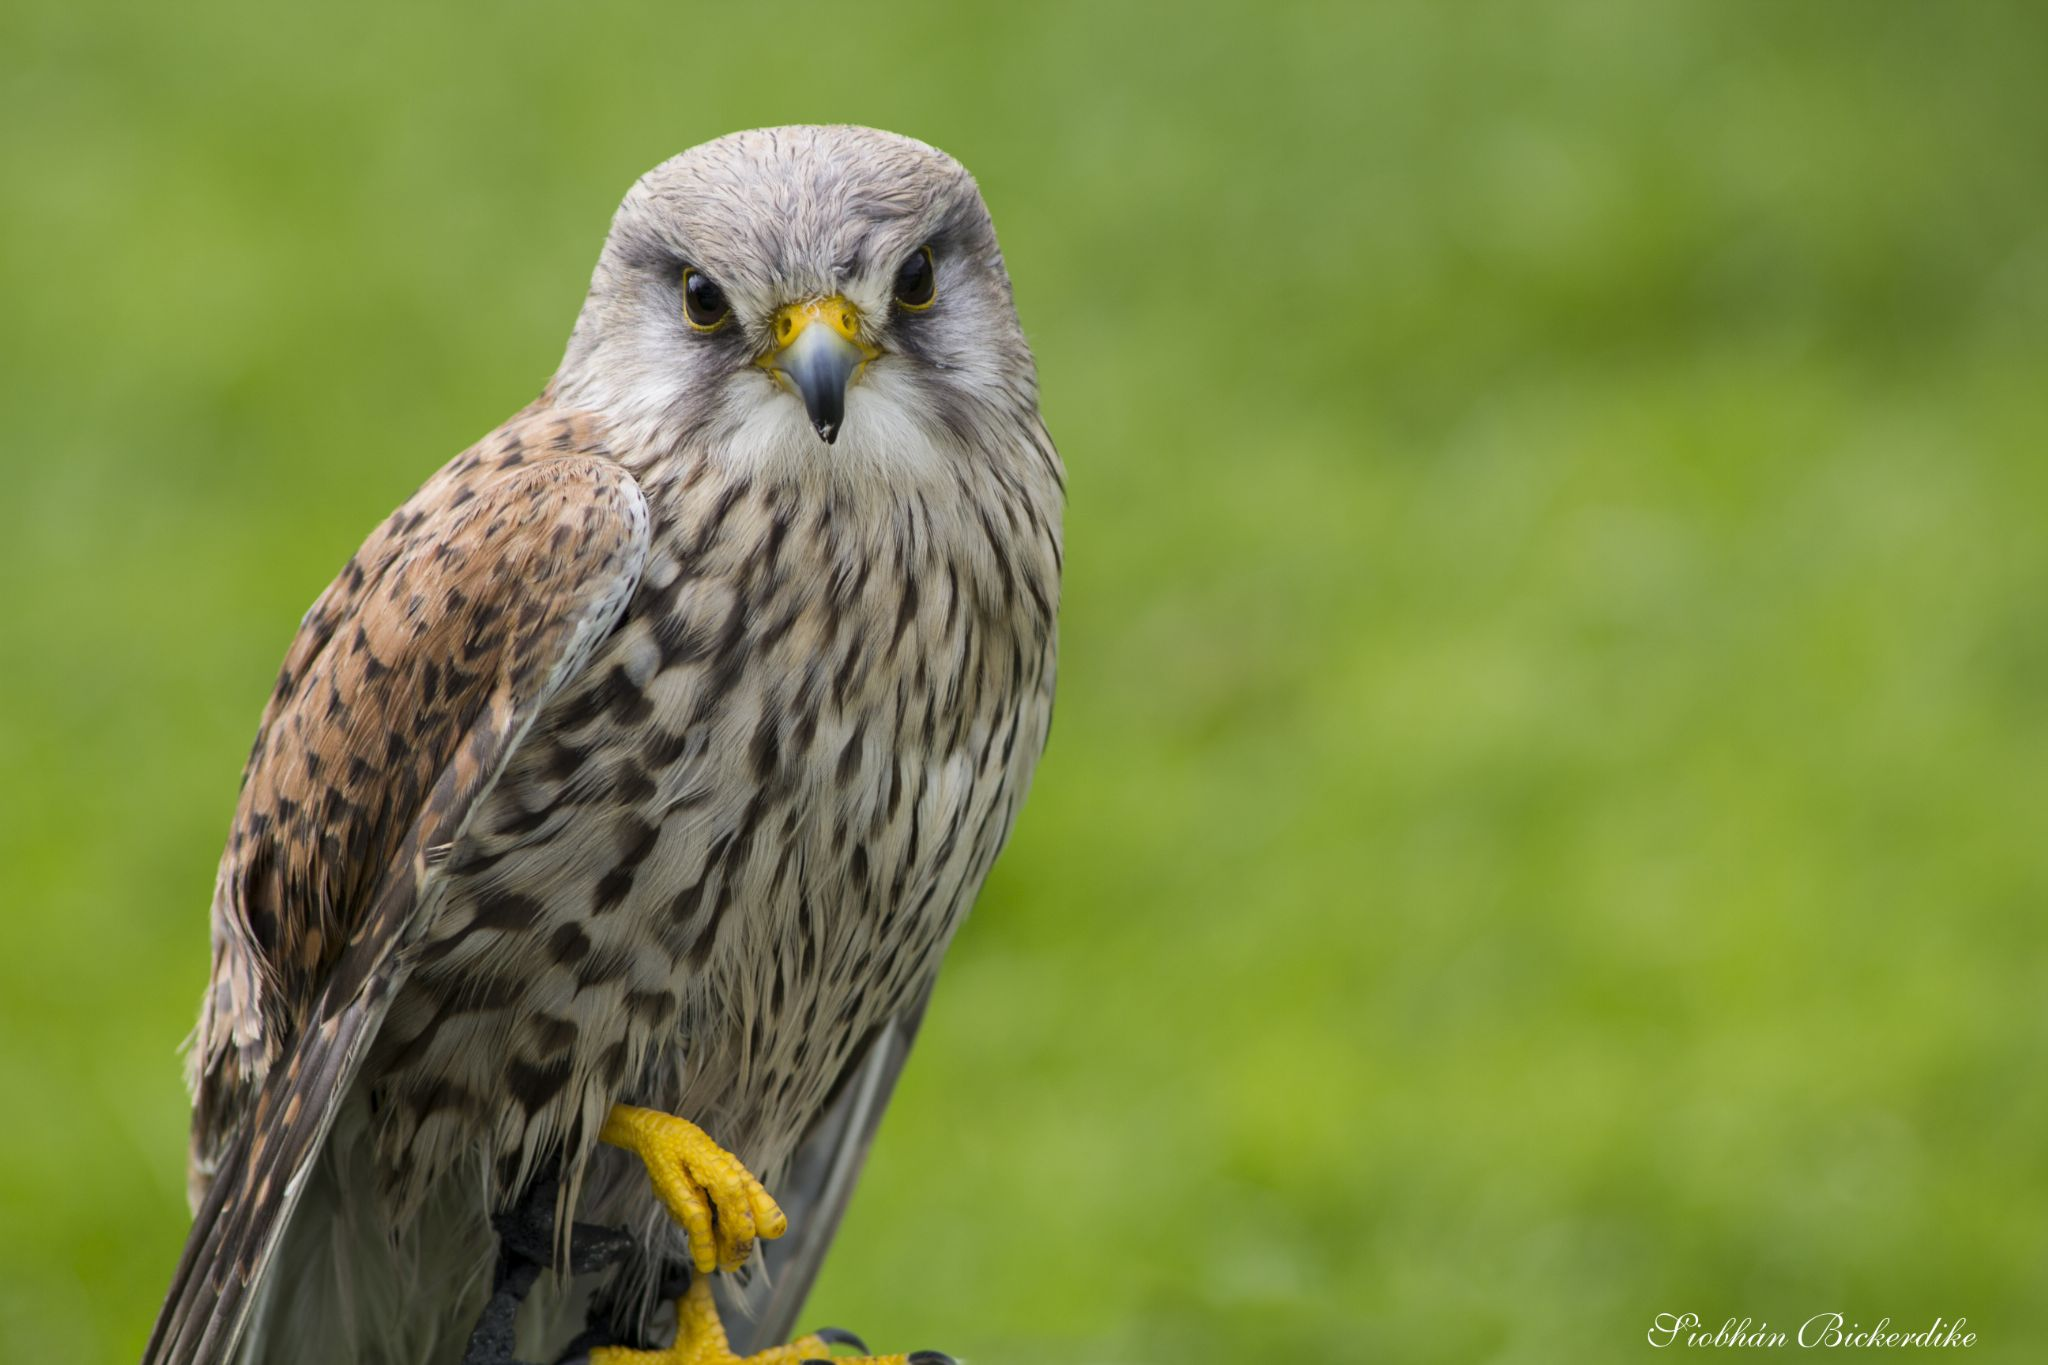 Bird by Siobhan Bickerdike